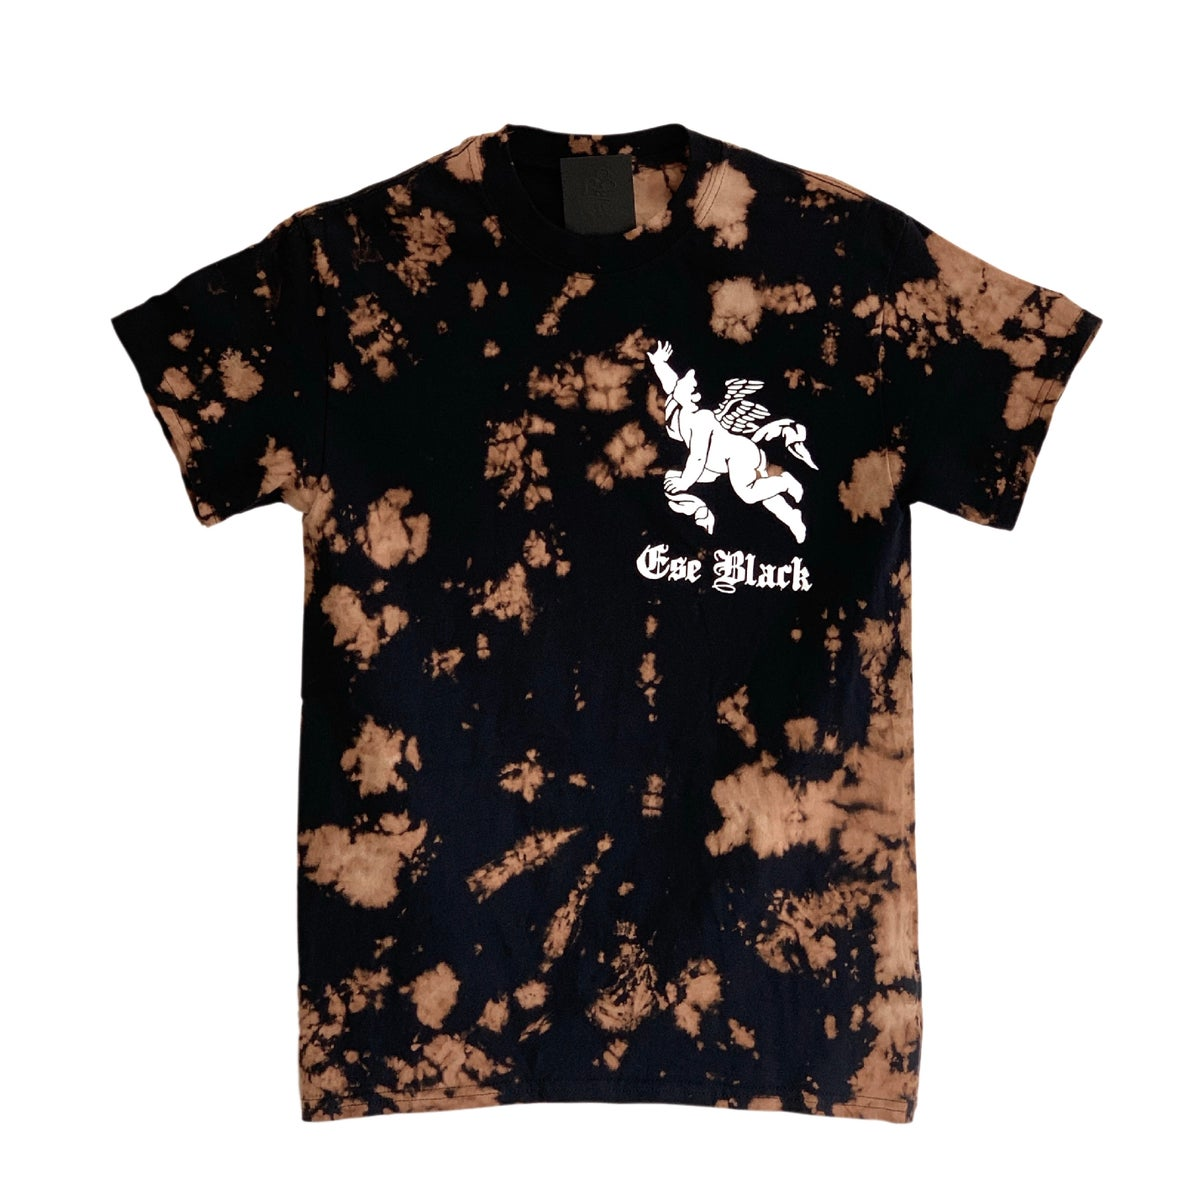 Image of Faith tie dye t-shirt